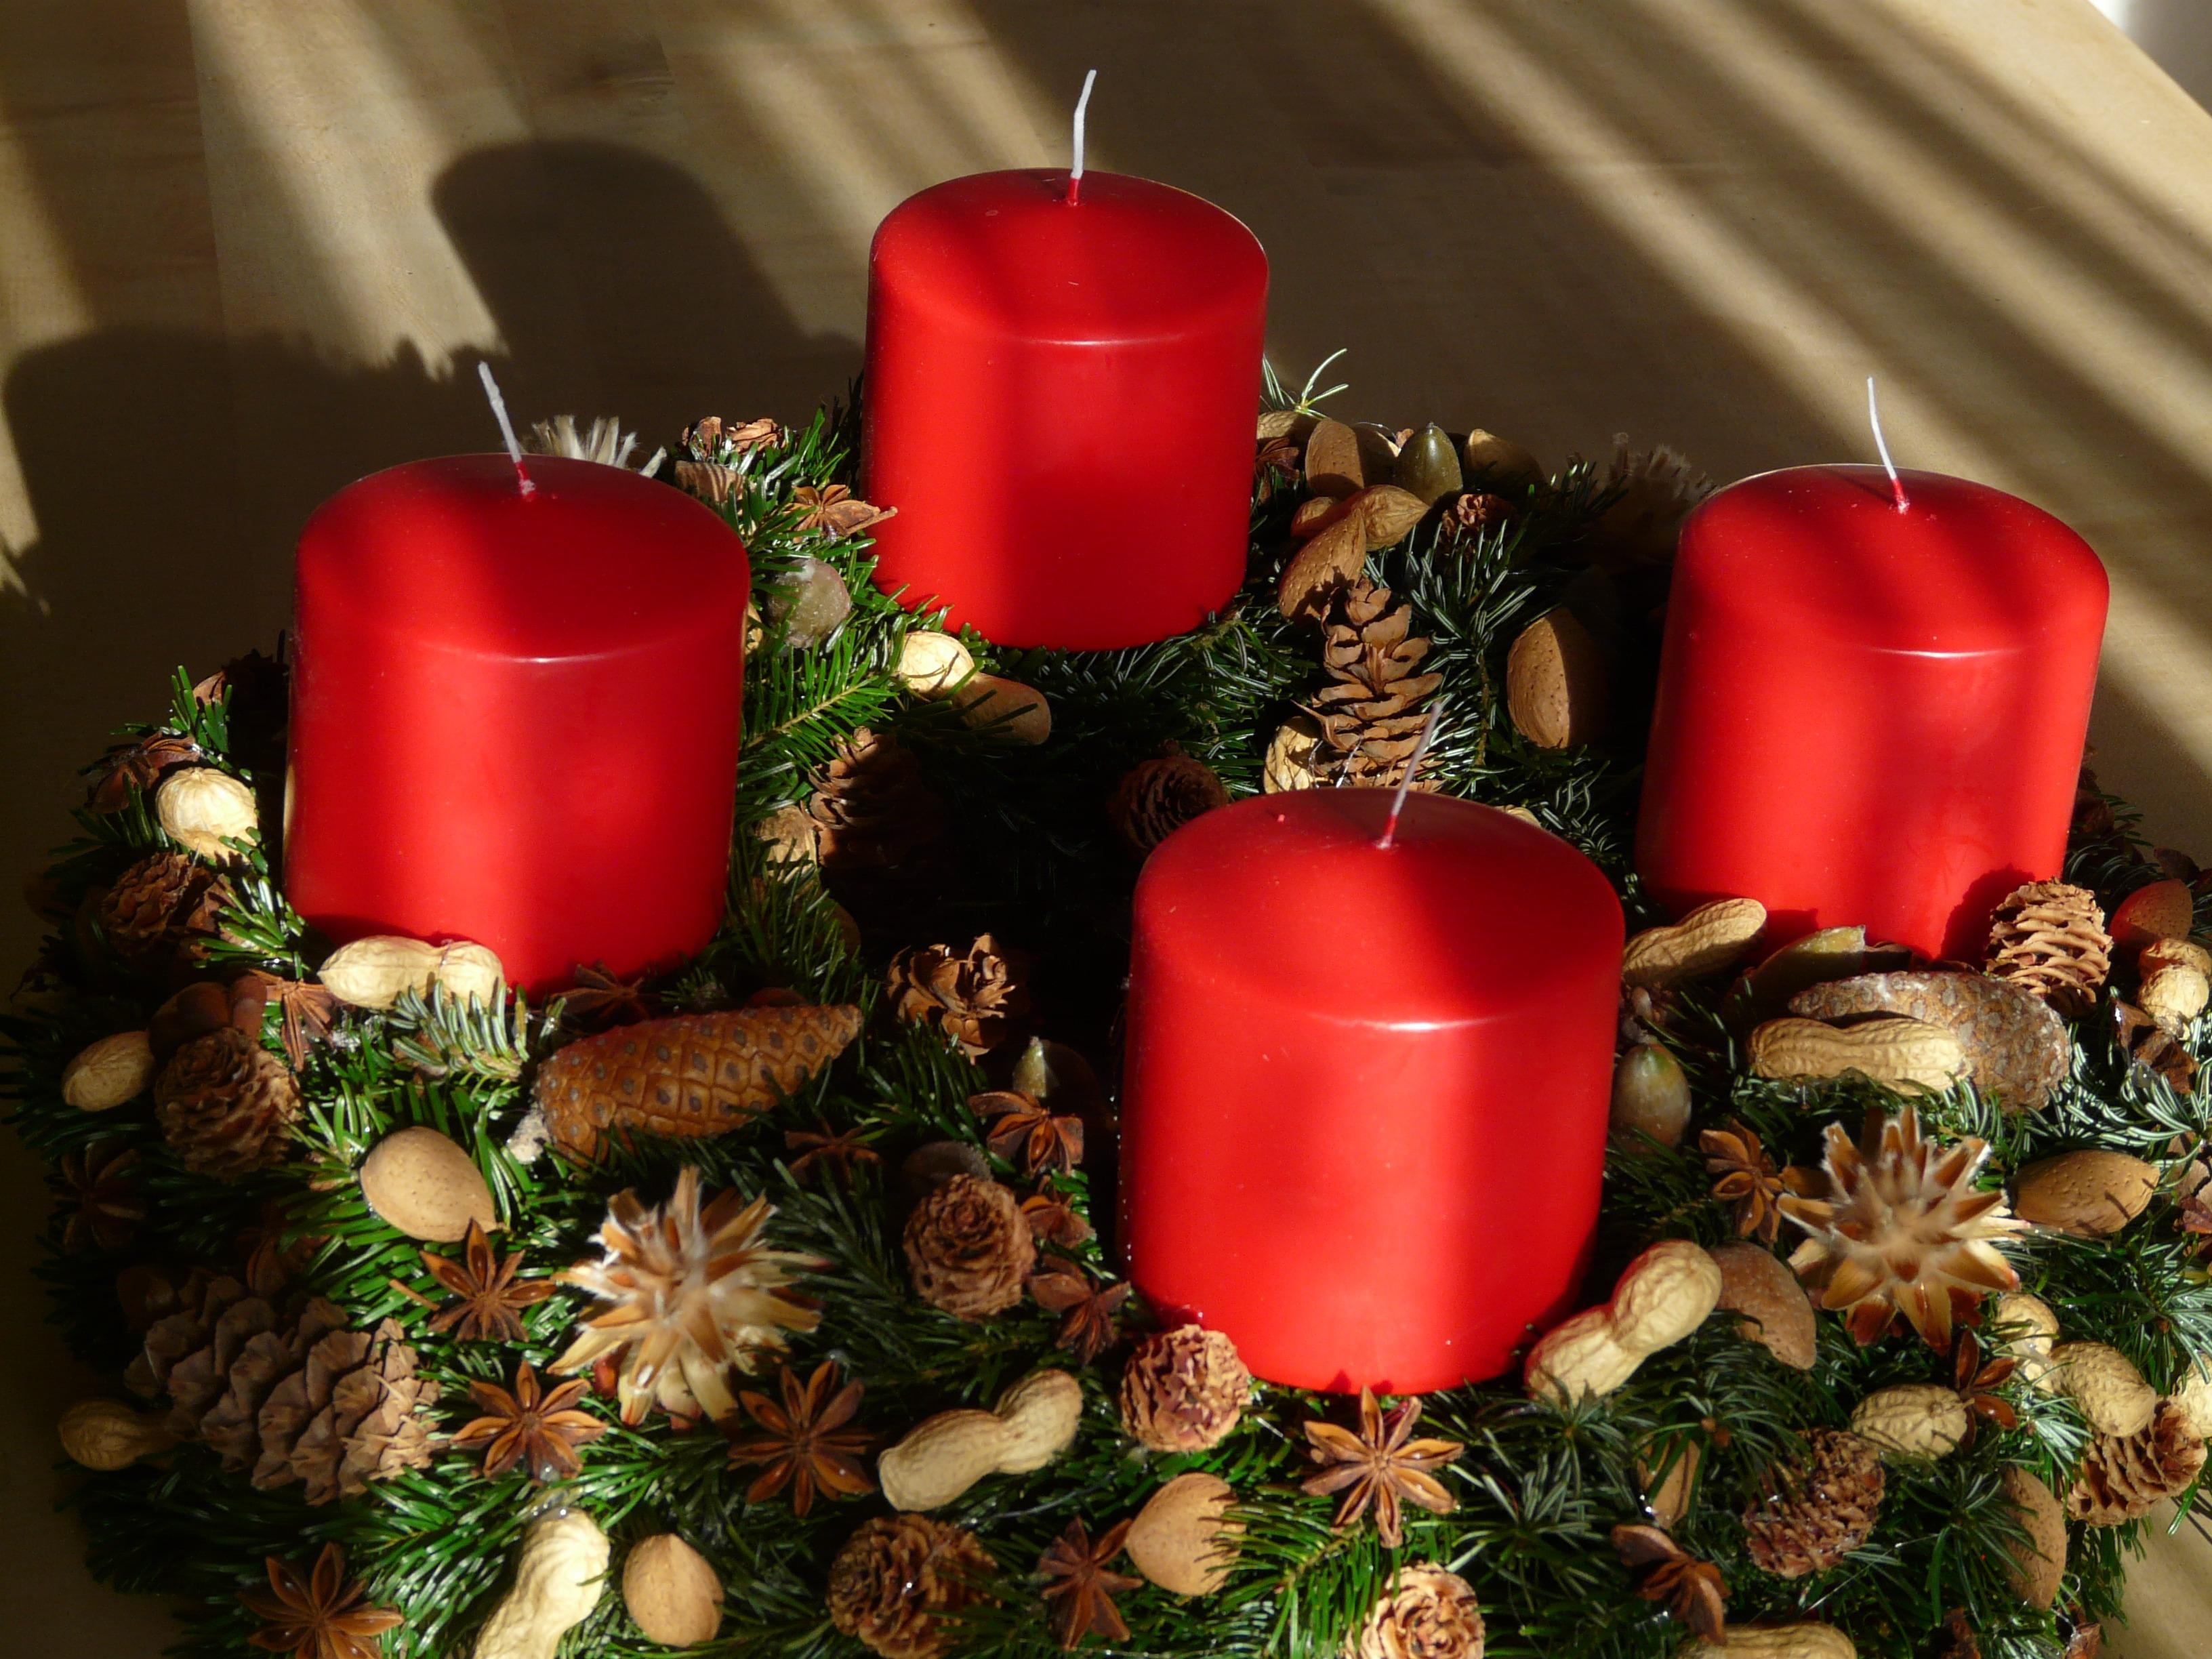 free images flower red holiday candle lighting. Black Bedroom Furniture Sets. Home Design Ideas